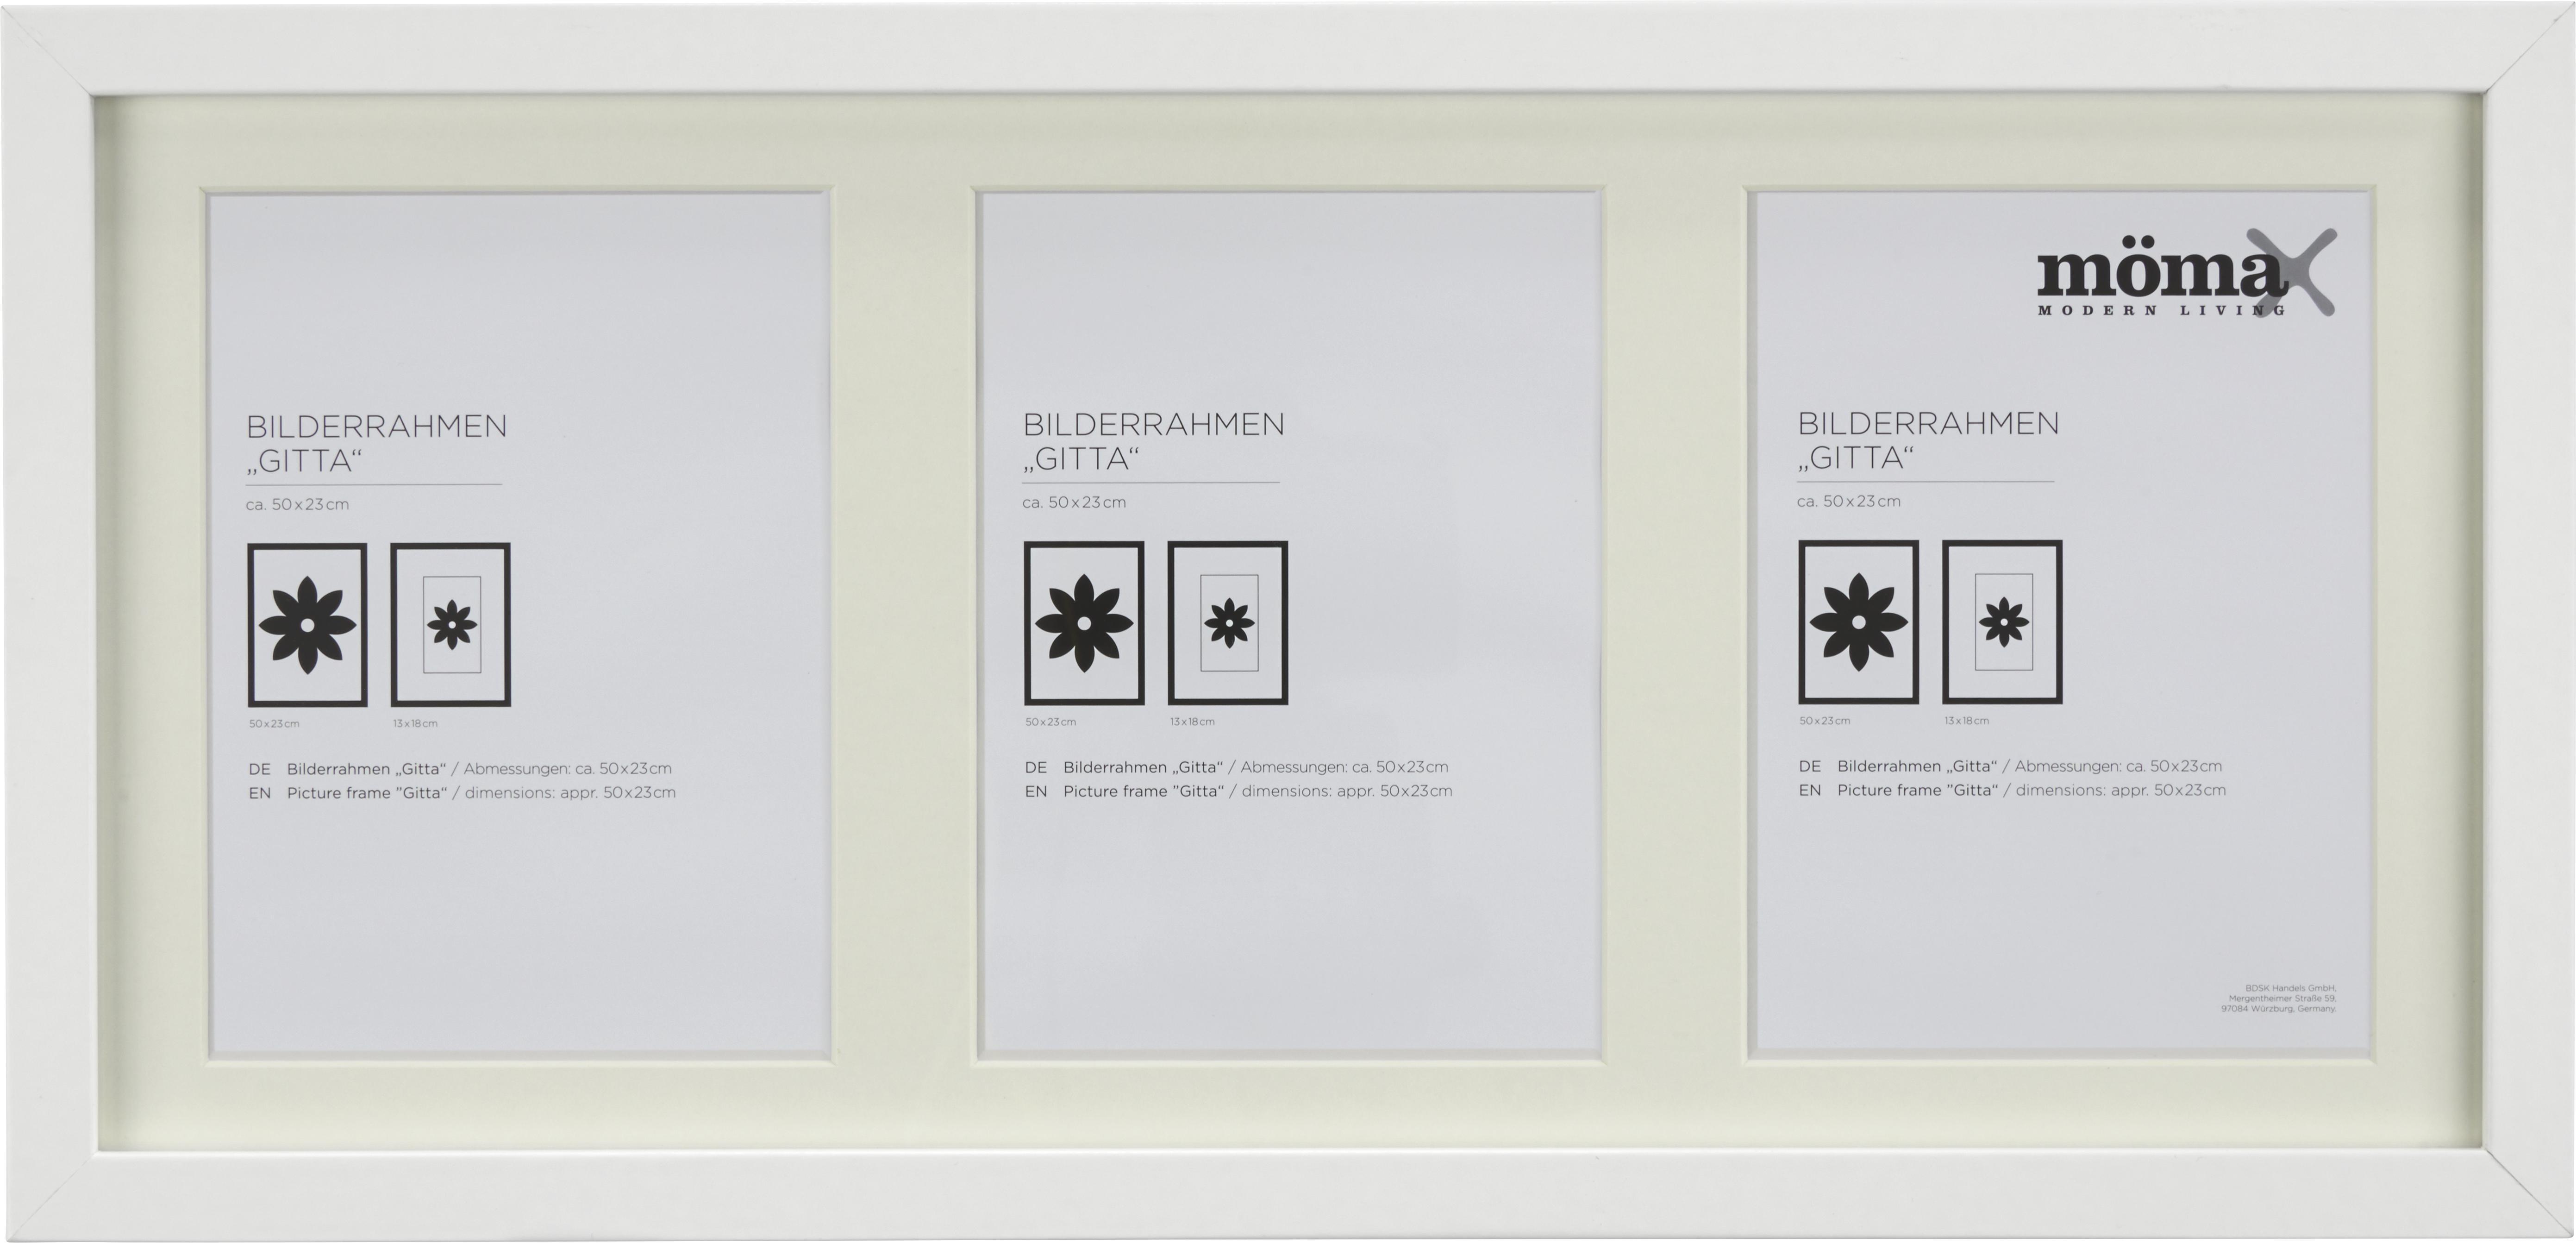 Bilderrahmen - Dekoration - Produkte | mömax | mömax